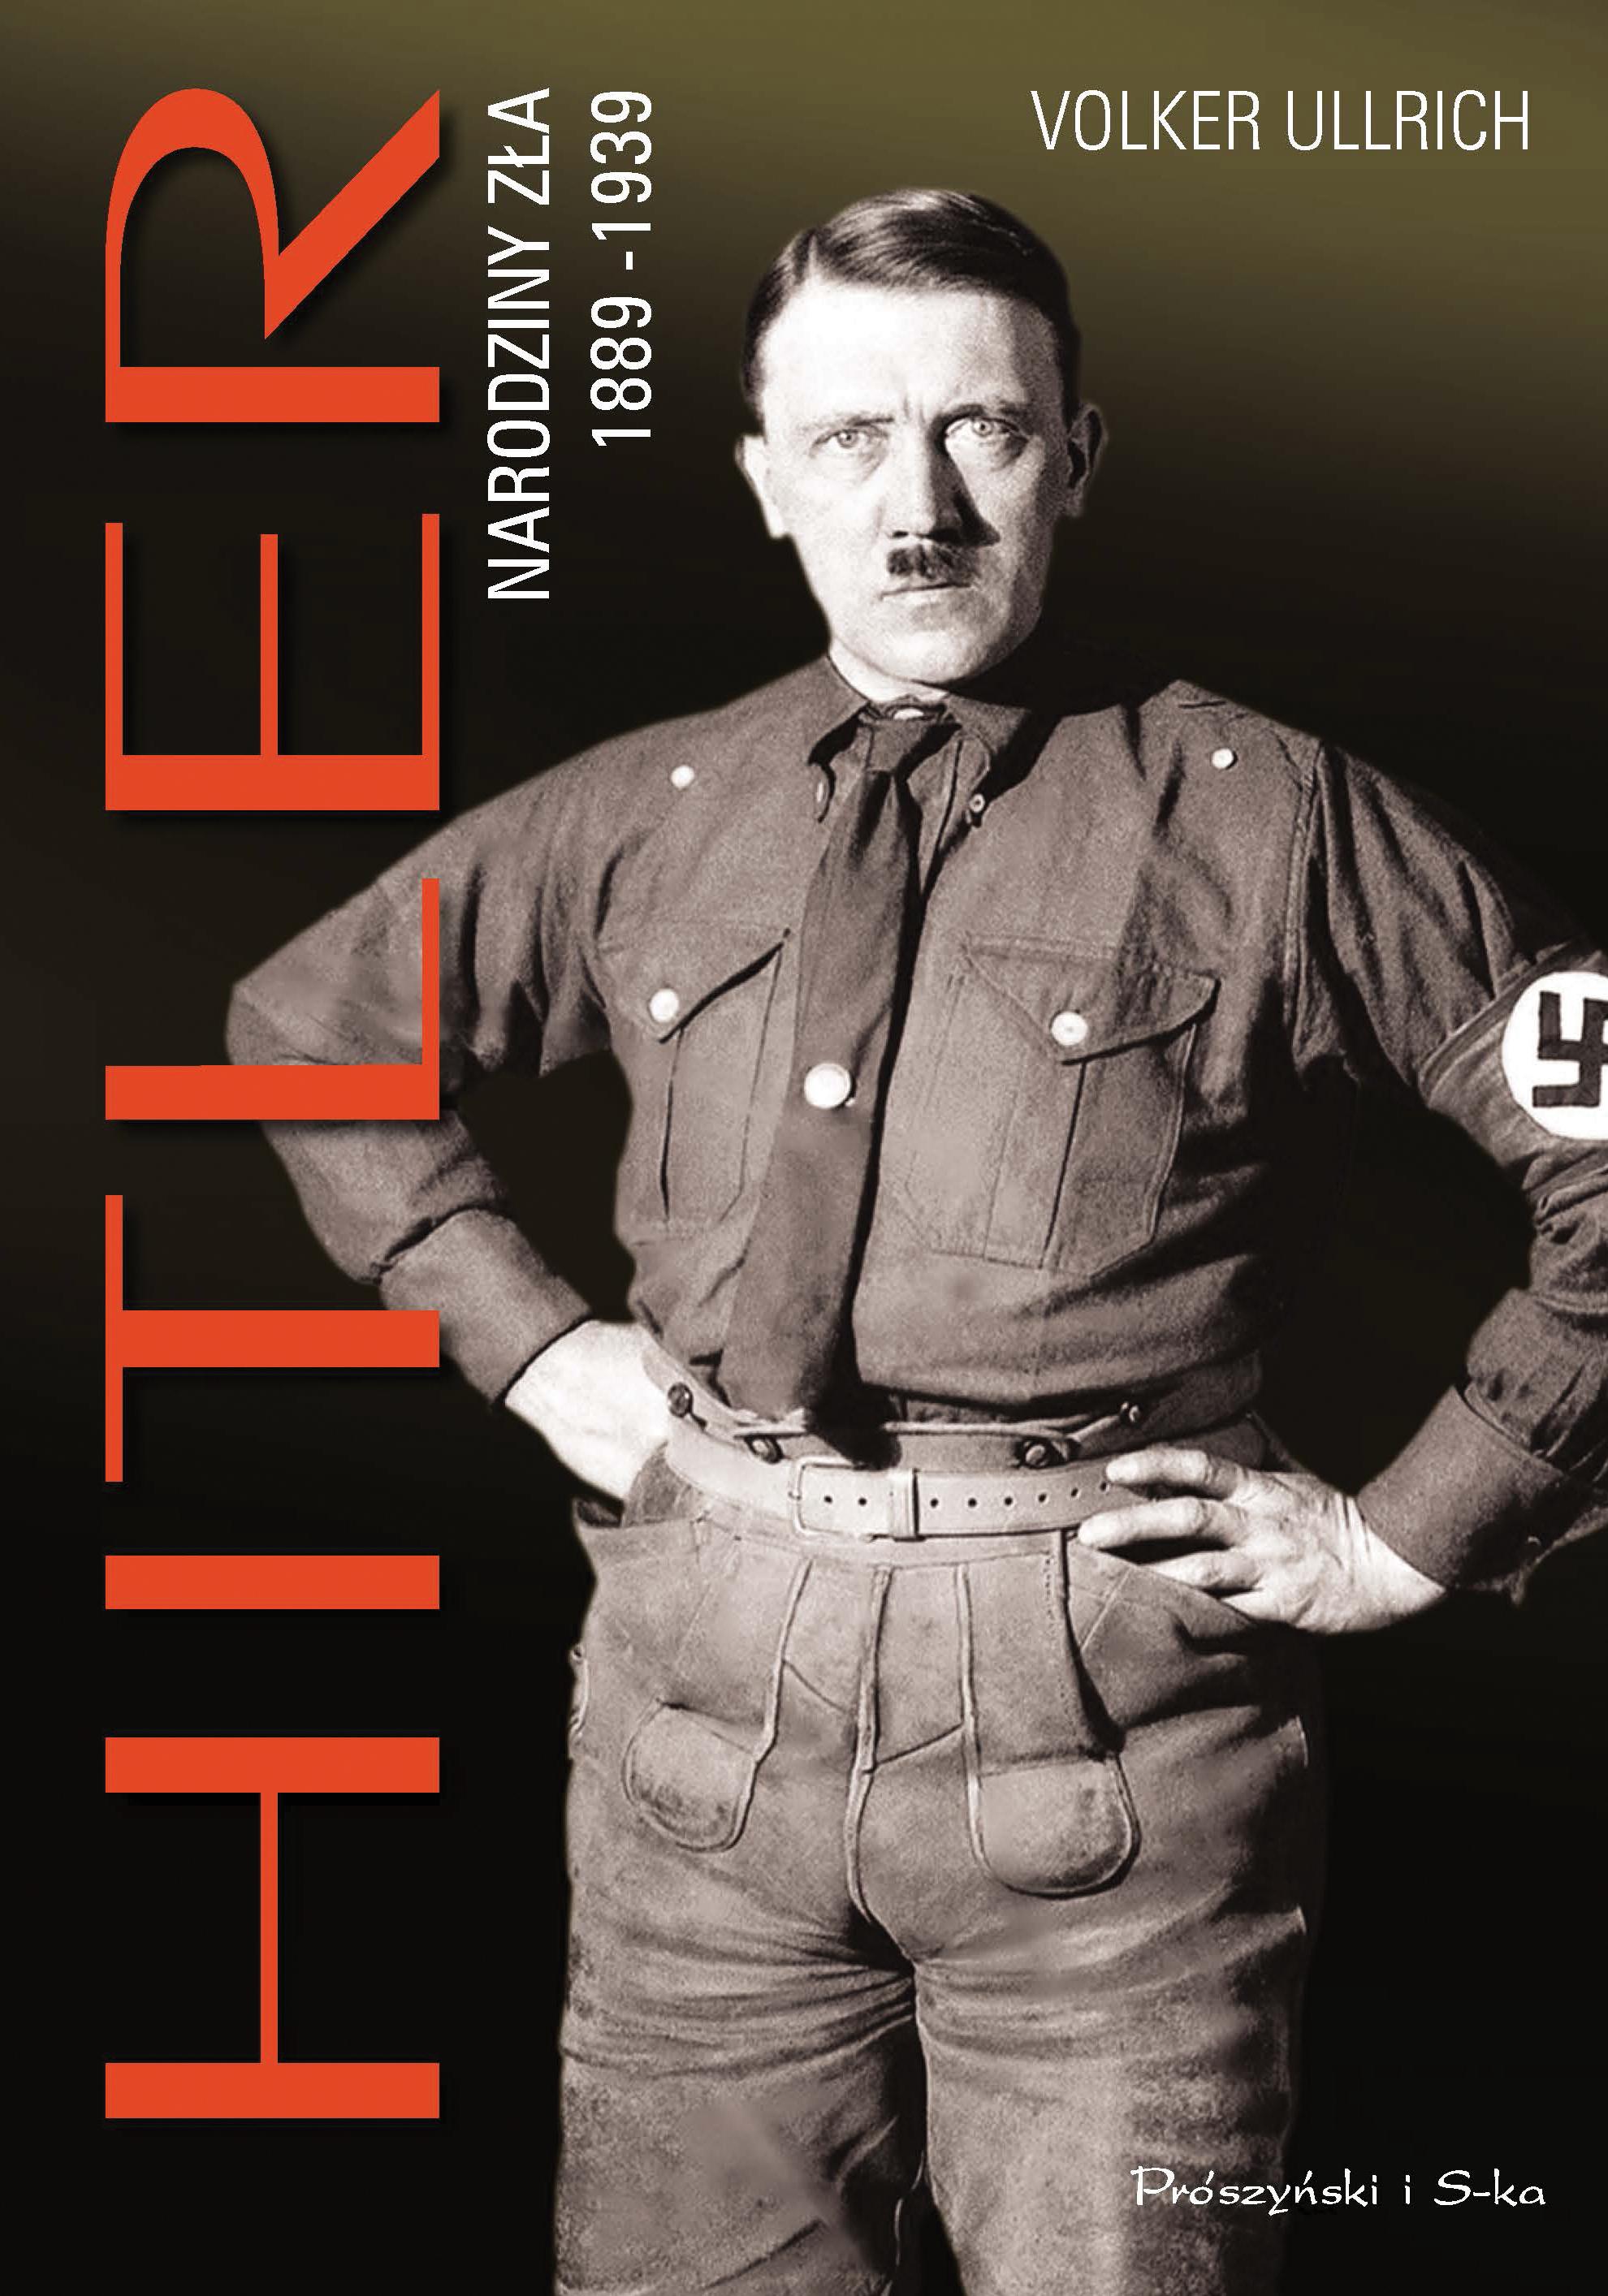 Volker Ullrich Hitler hitler